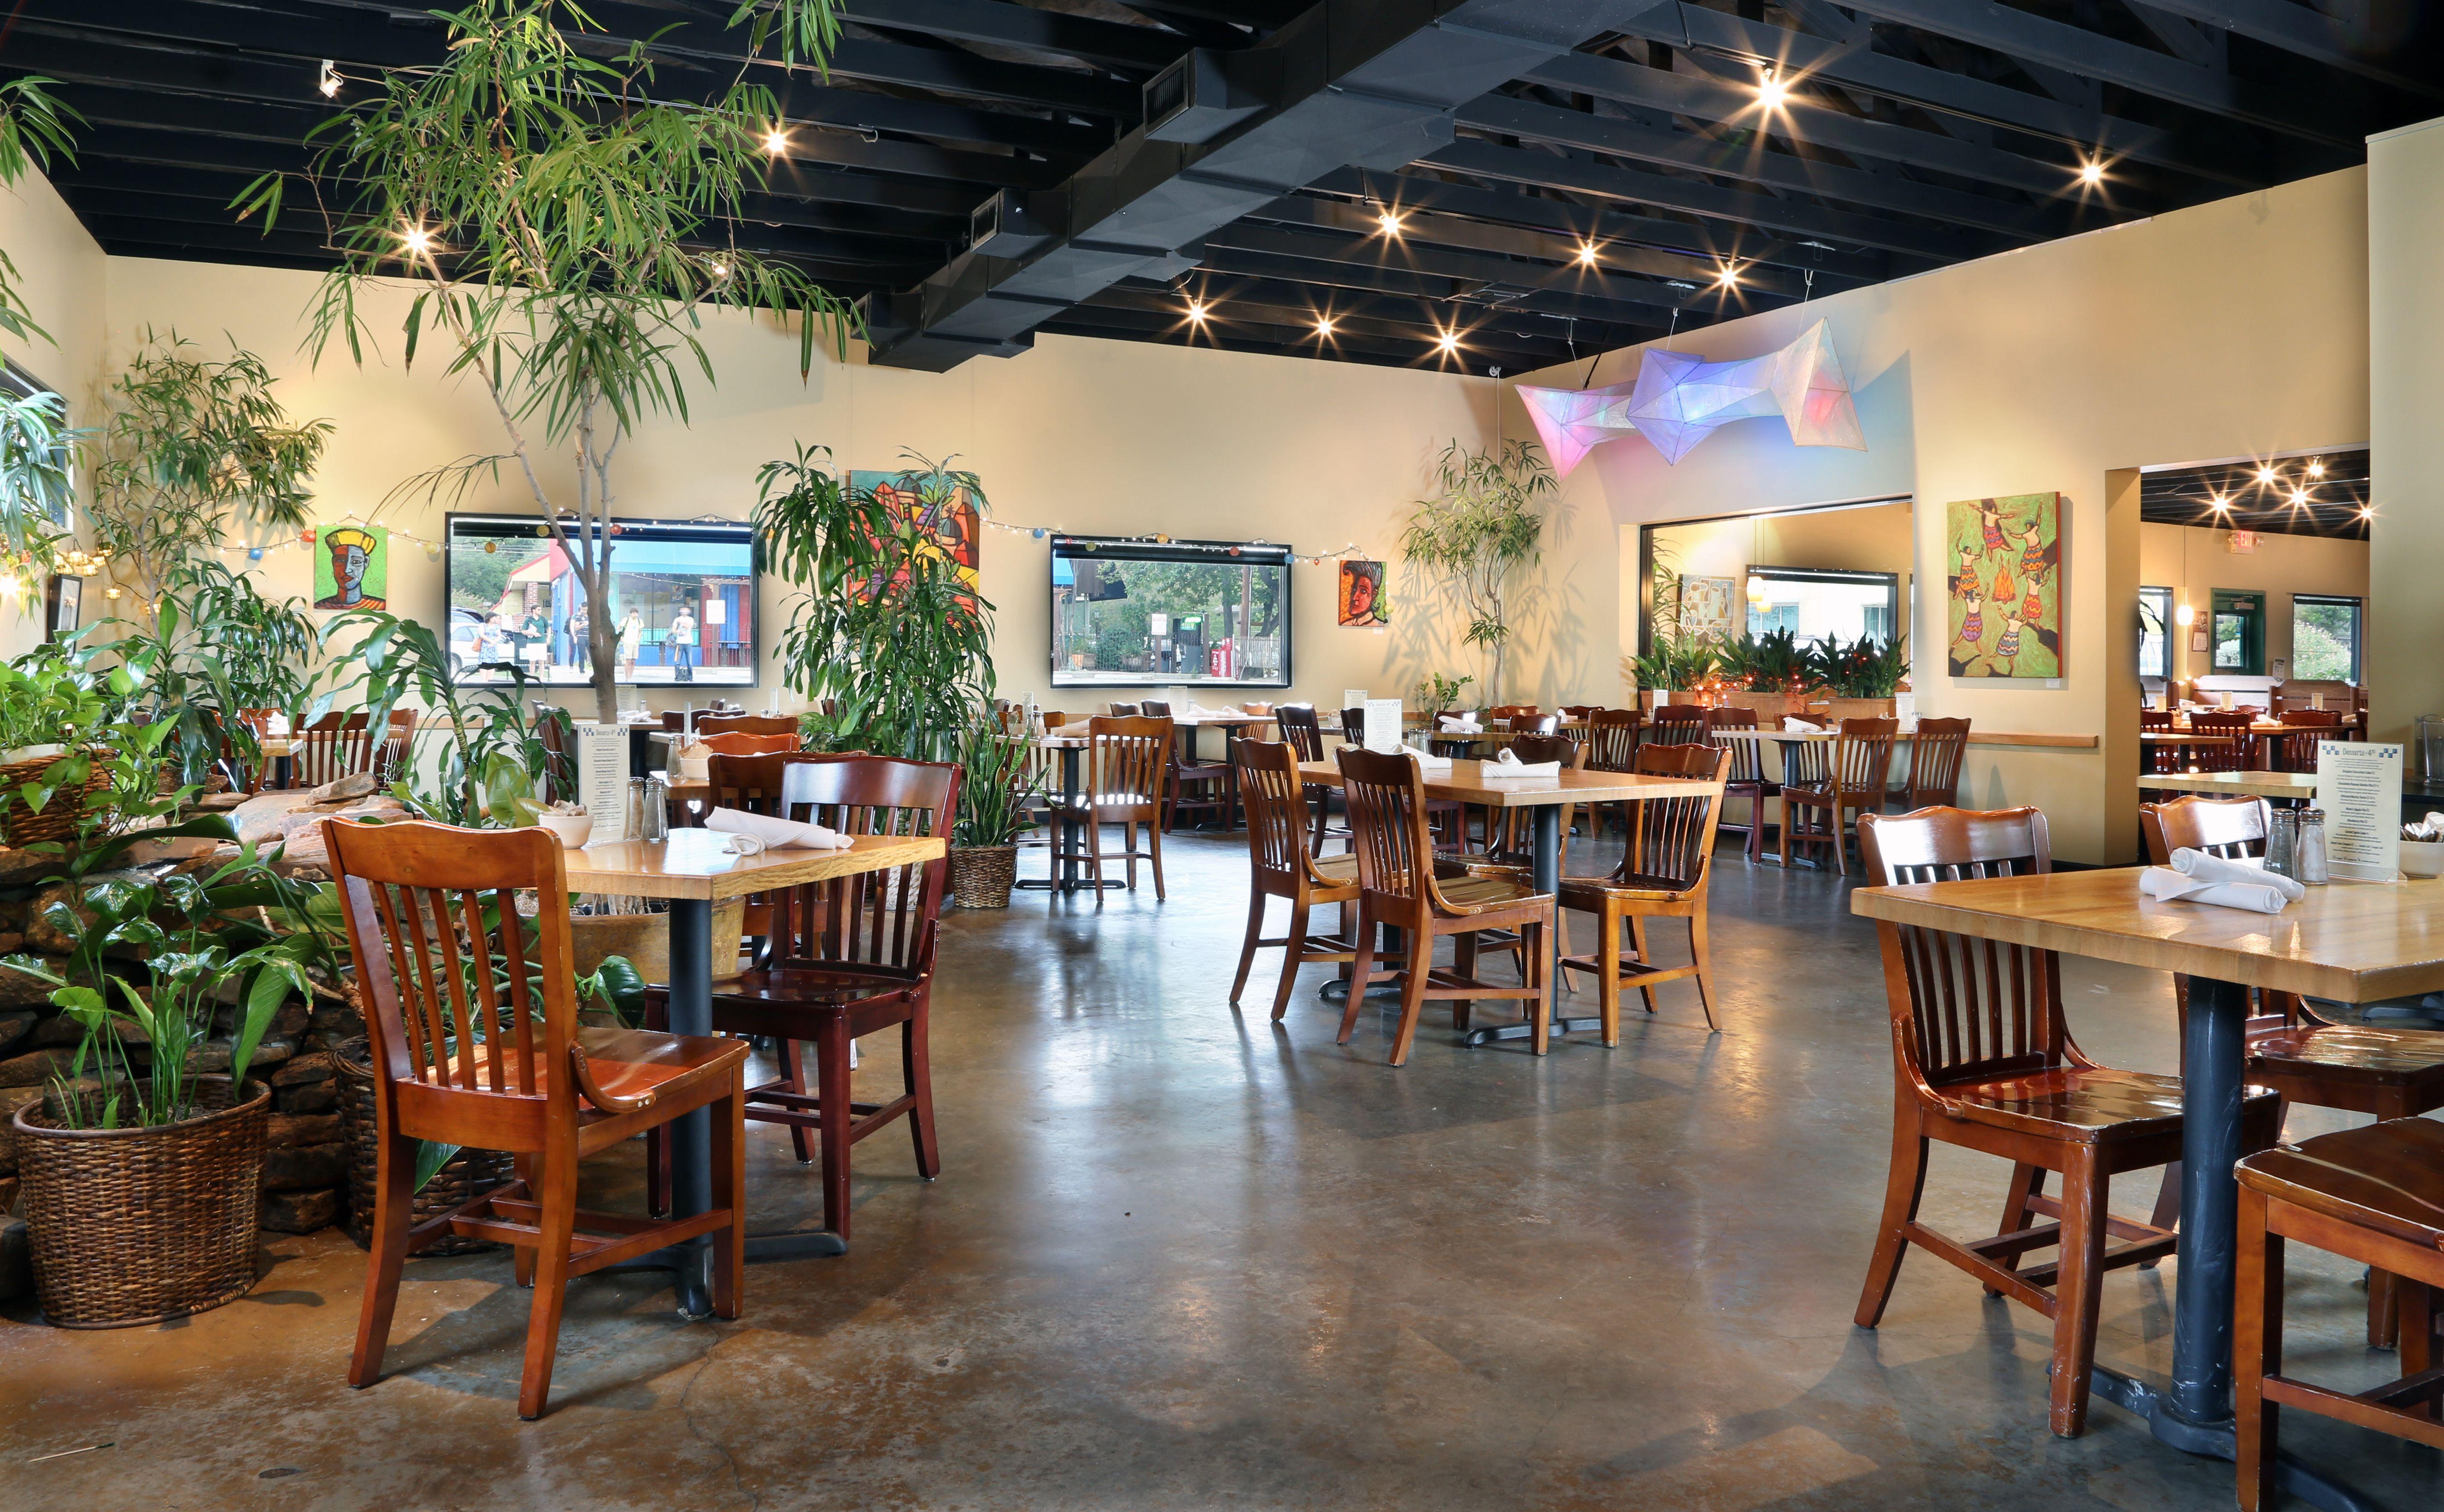 Mothers Cafe & Garden - 4215 Duval St, Austin, Tx